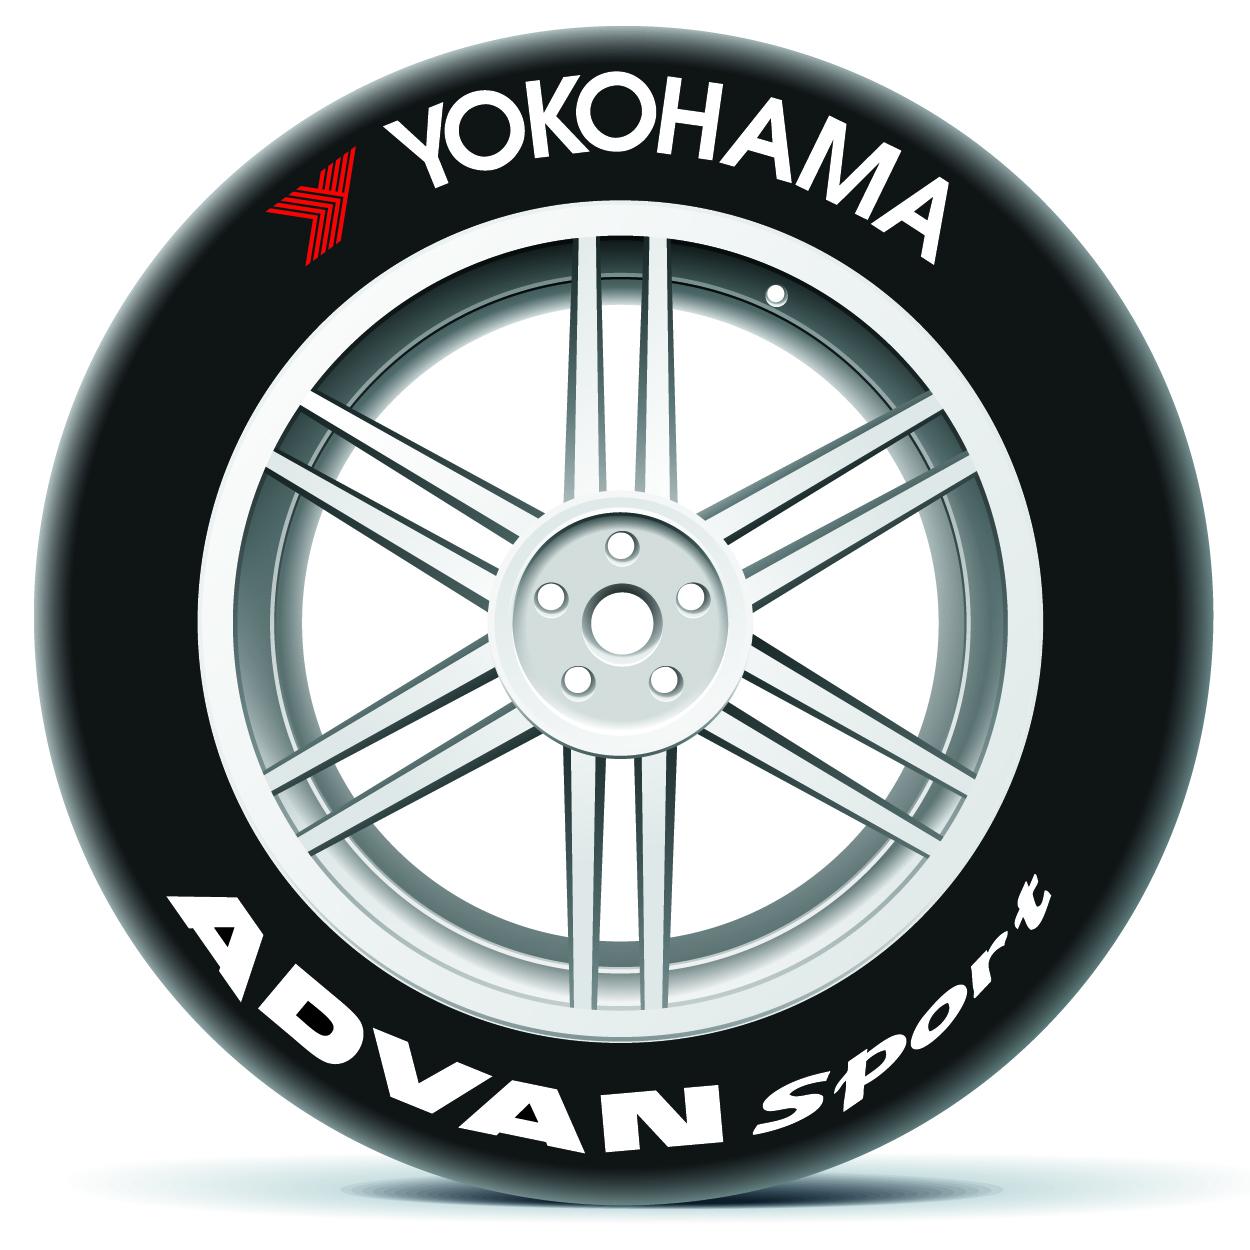 Yokohama Tire Lettering >> Yokohama On Top And Advan Sport Tire Stickers Canada